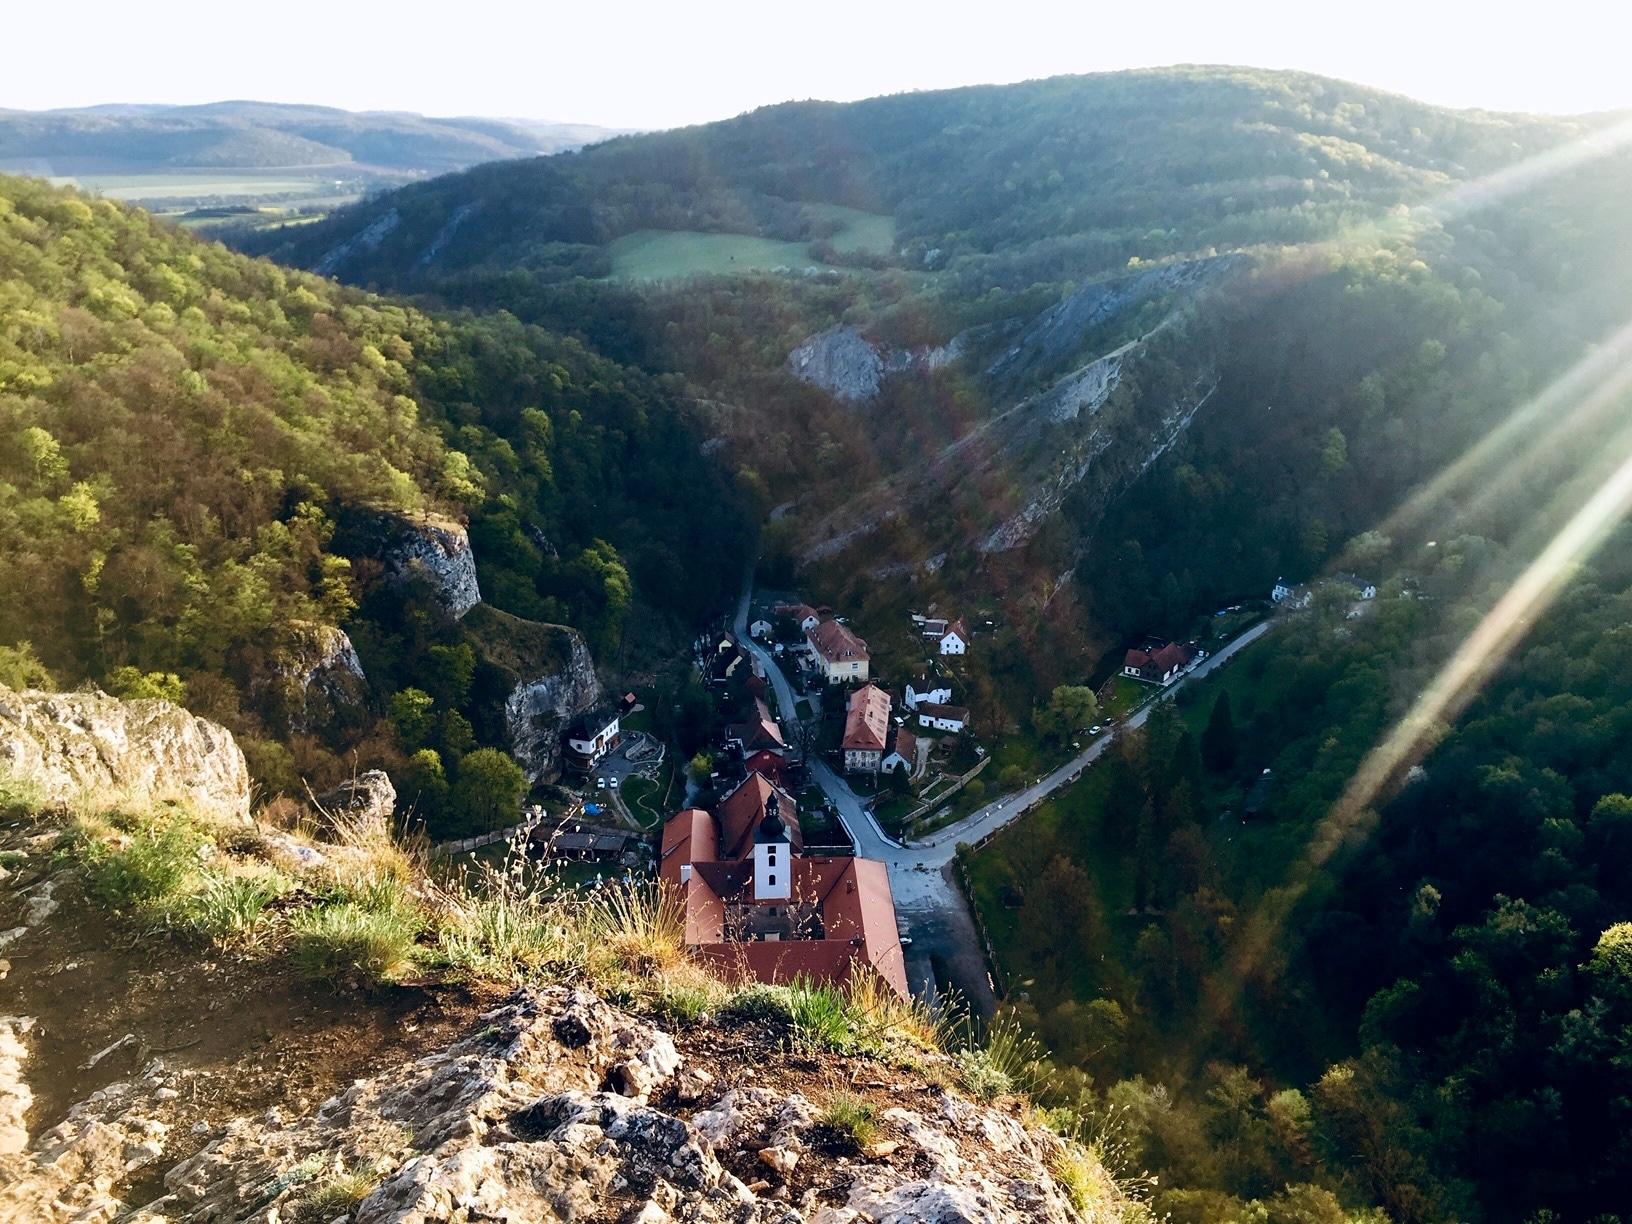 Mirador de Svaty Jan pod Skalou dentro de la reserva natural de Karlstejn